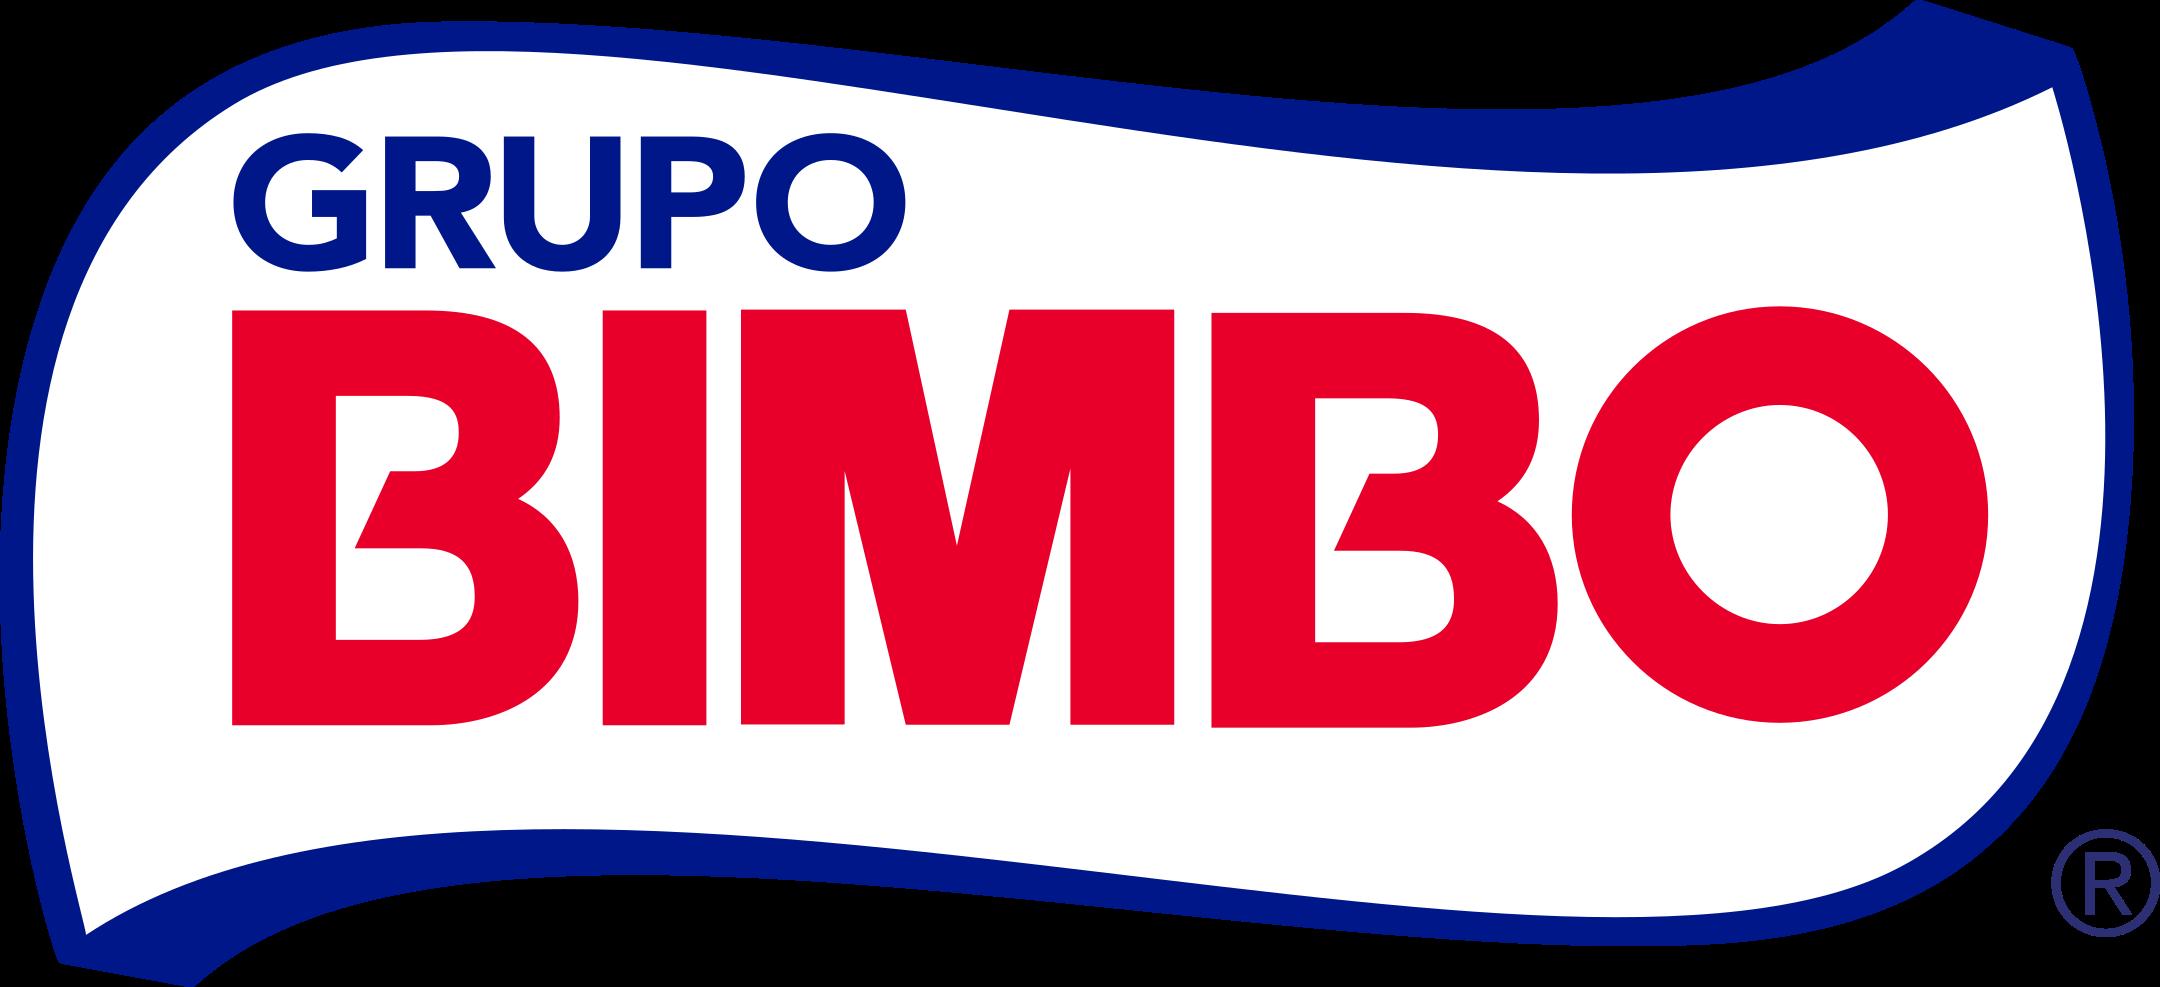 grupo bimbo logo 1 - Grupo Bimbo Logo